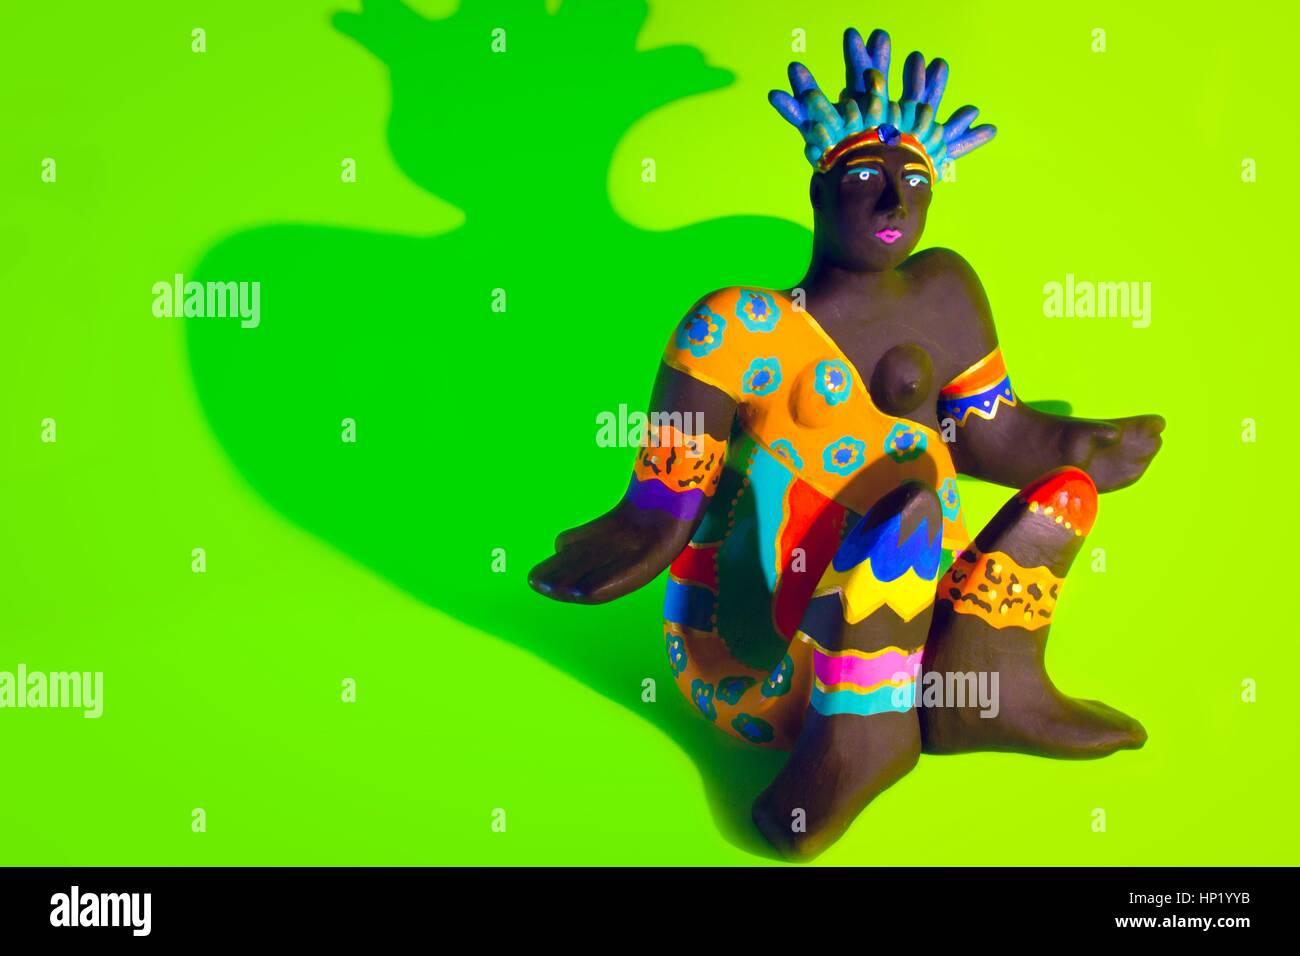 Multicolored decoration - Stock Image